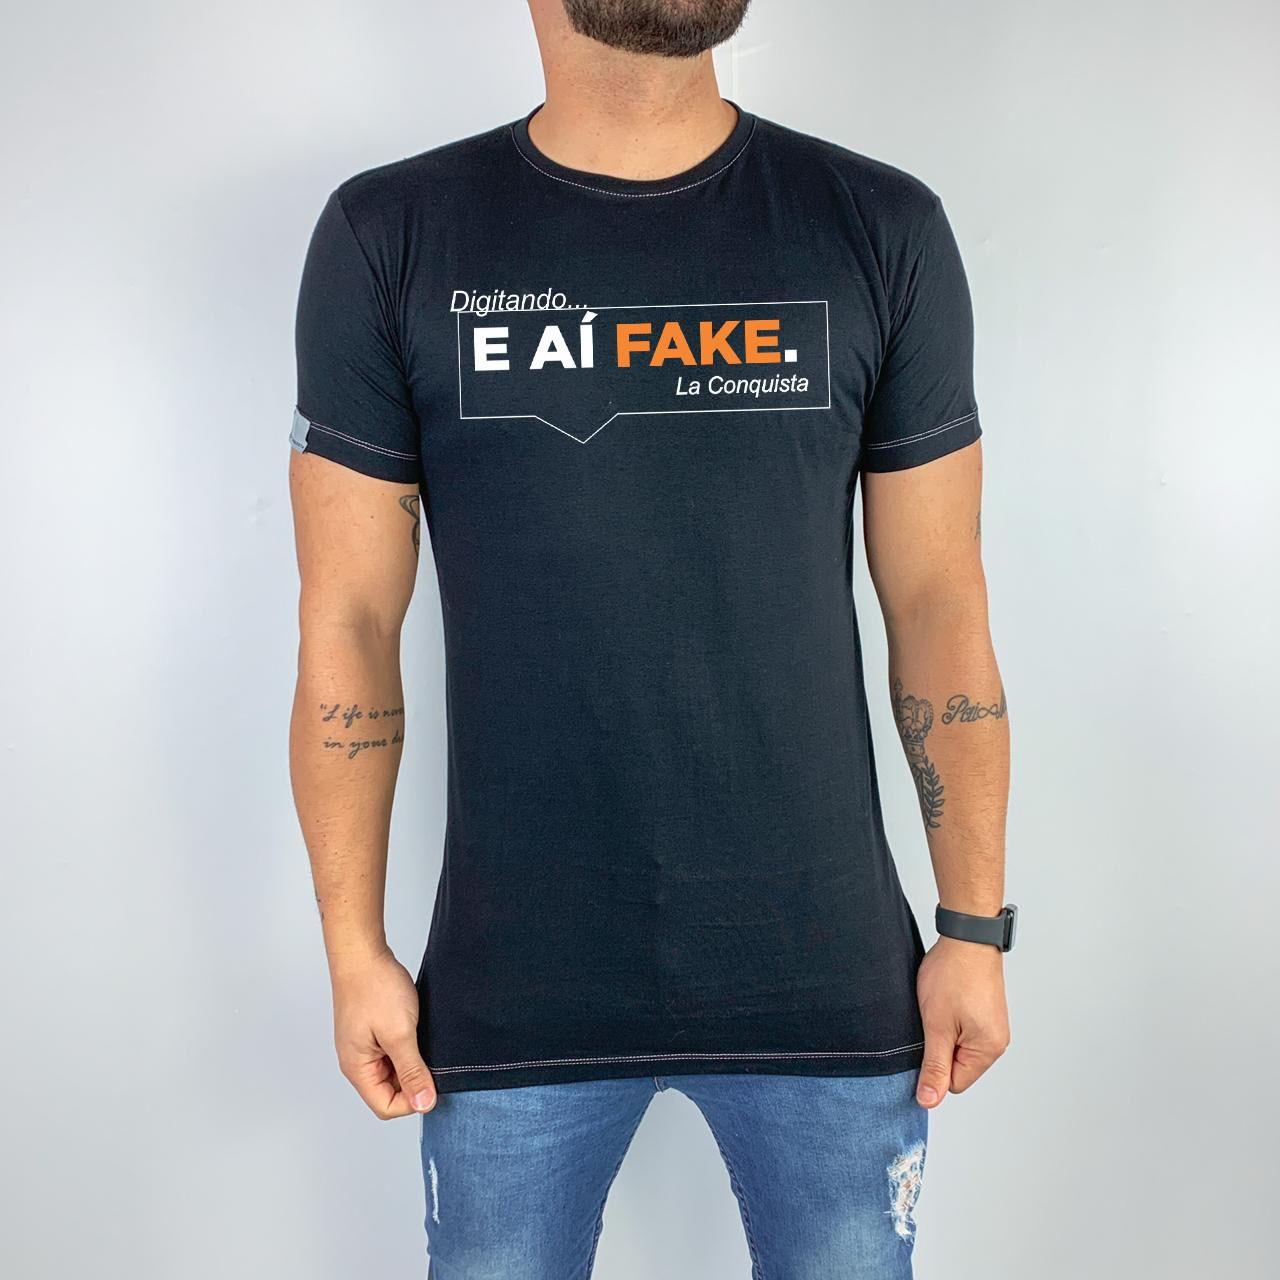 Camiseta E aí fake